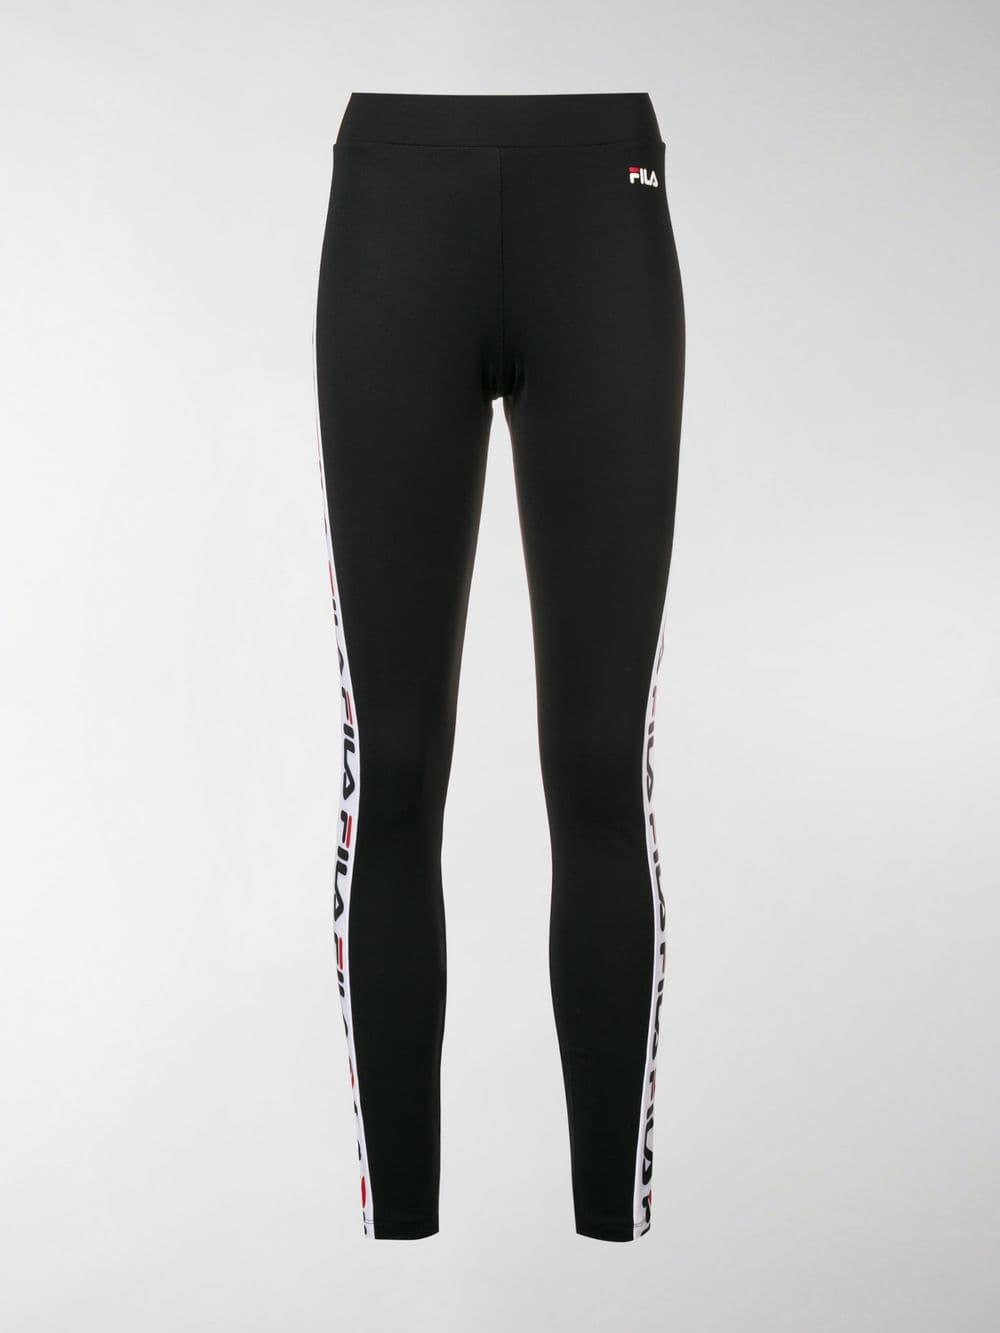 7e8452c6da196 Lyst - Fila Logo Side Stripe leggings in Black